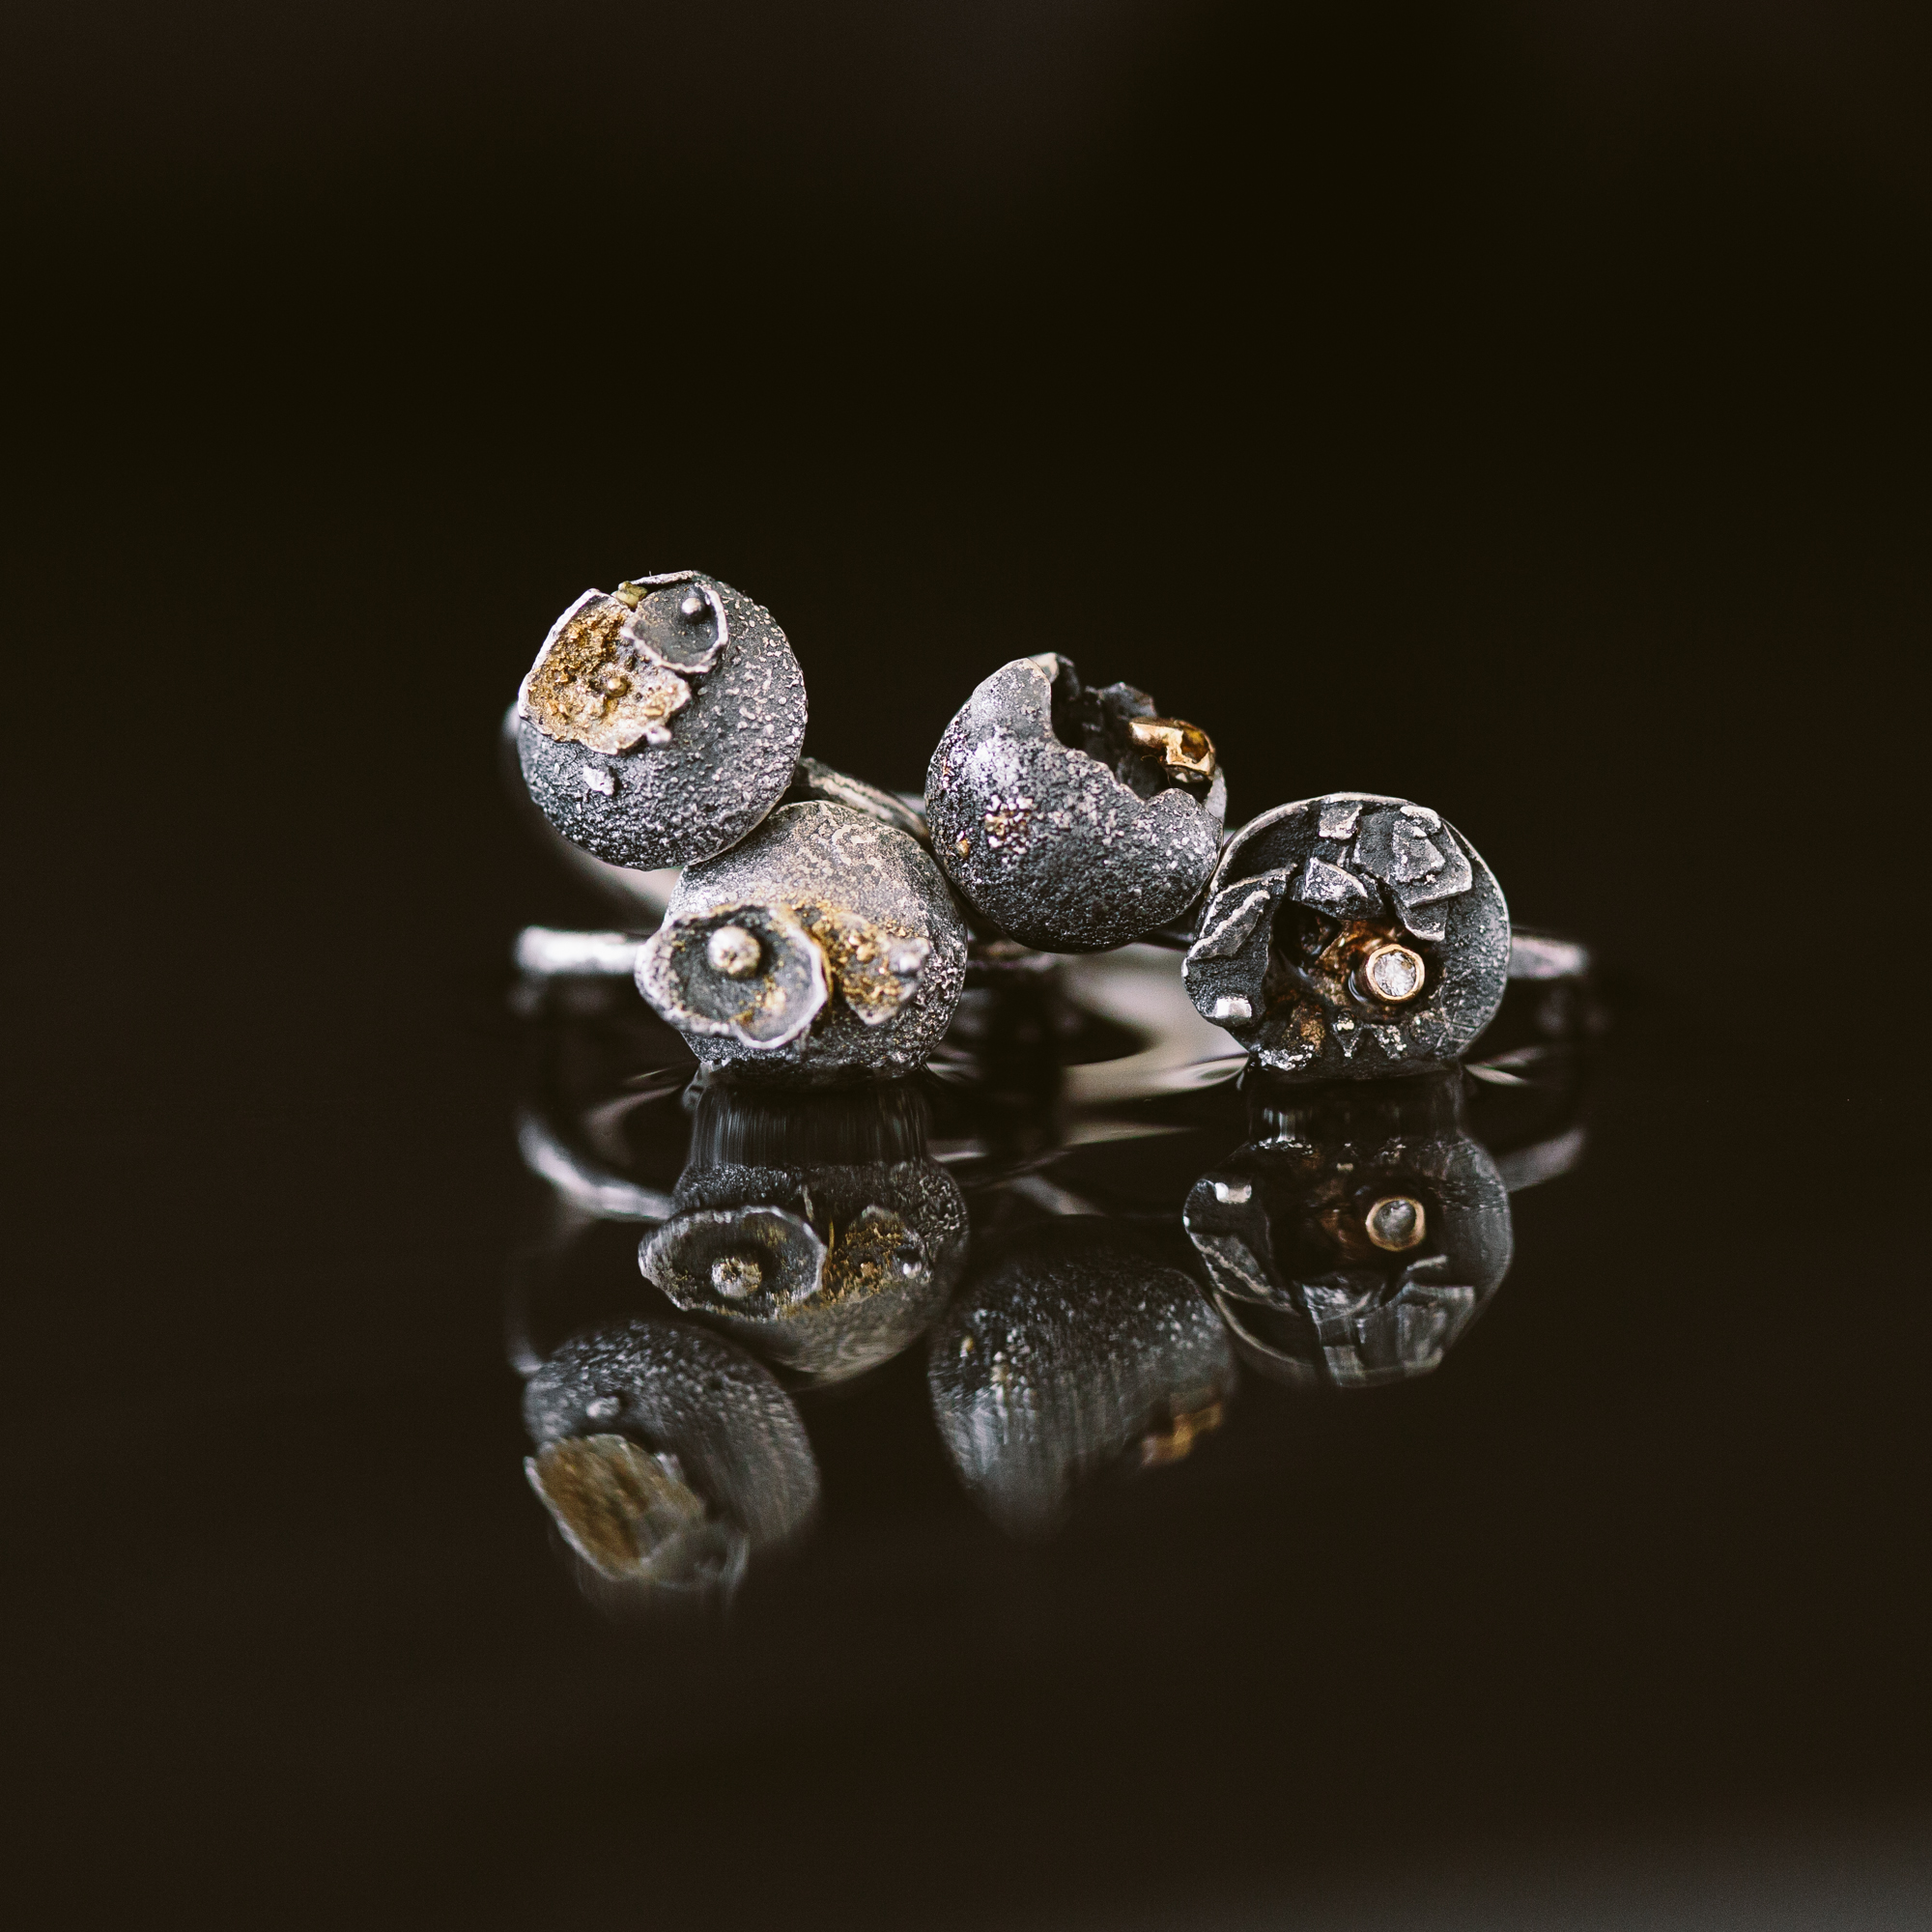 Argentium Silver, 18k Gold, Diamond Rings